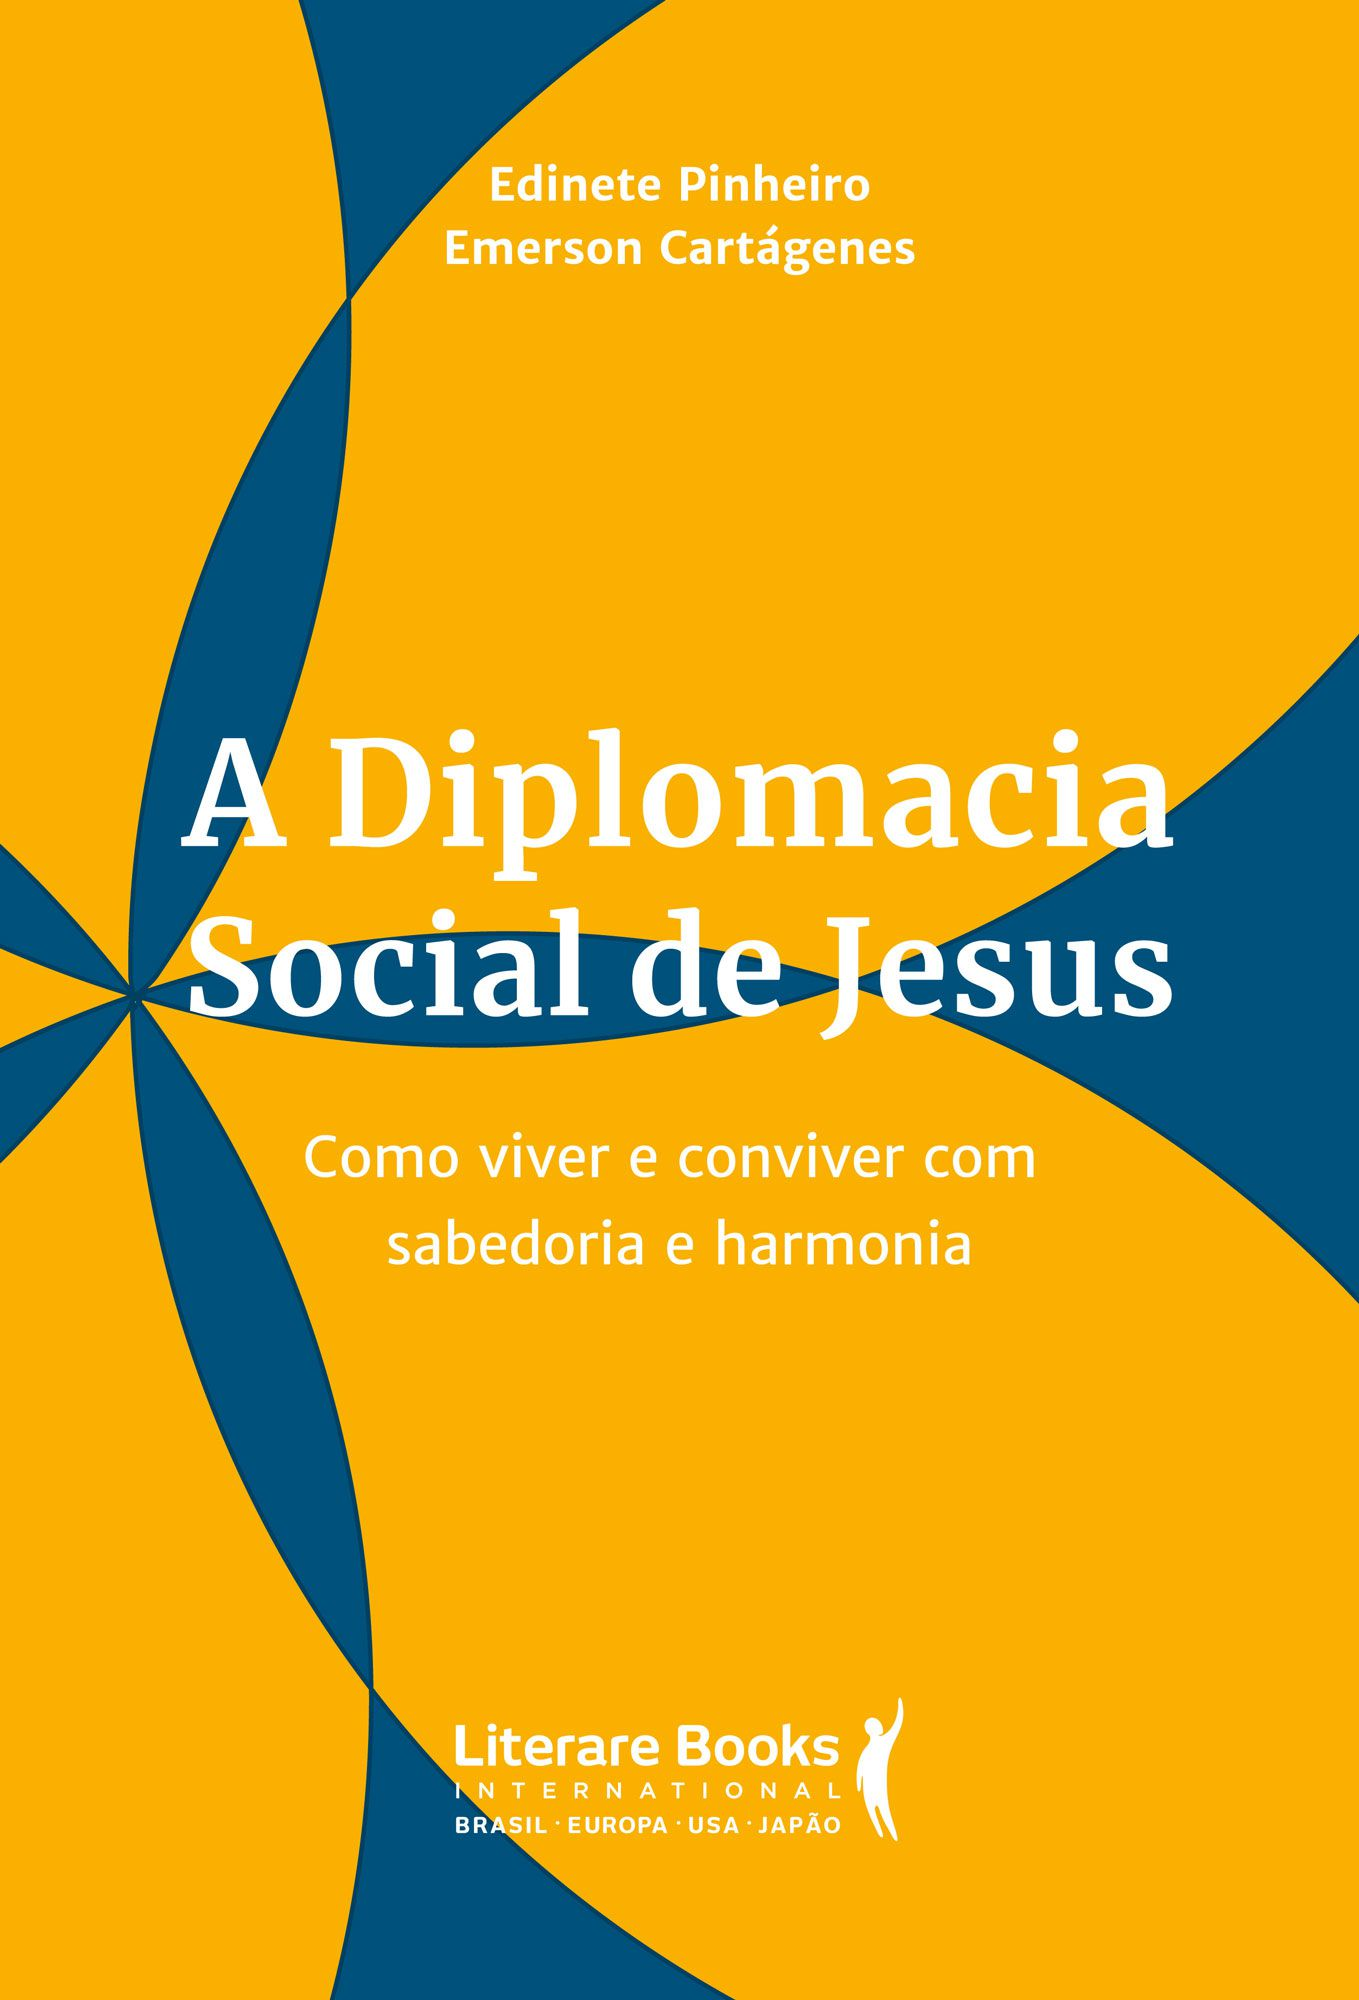 A diplomacia social de jesus: como viver e conviver com sabedoria e harmonia